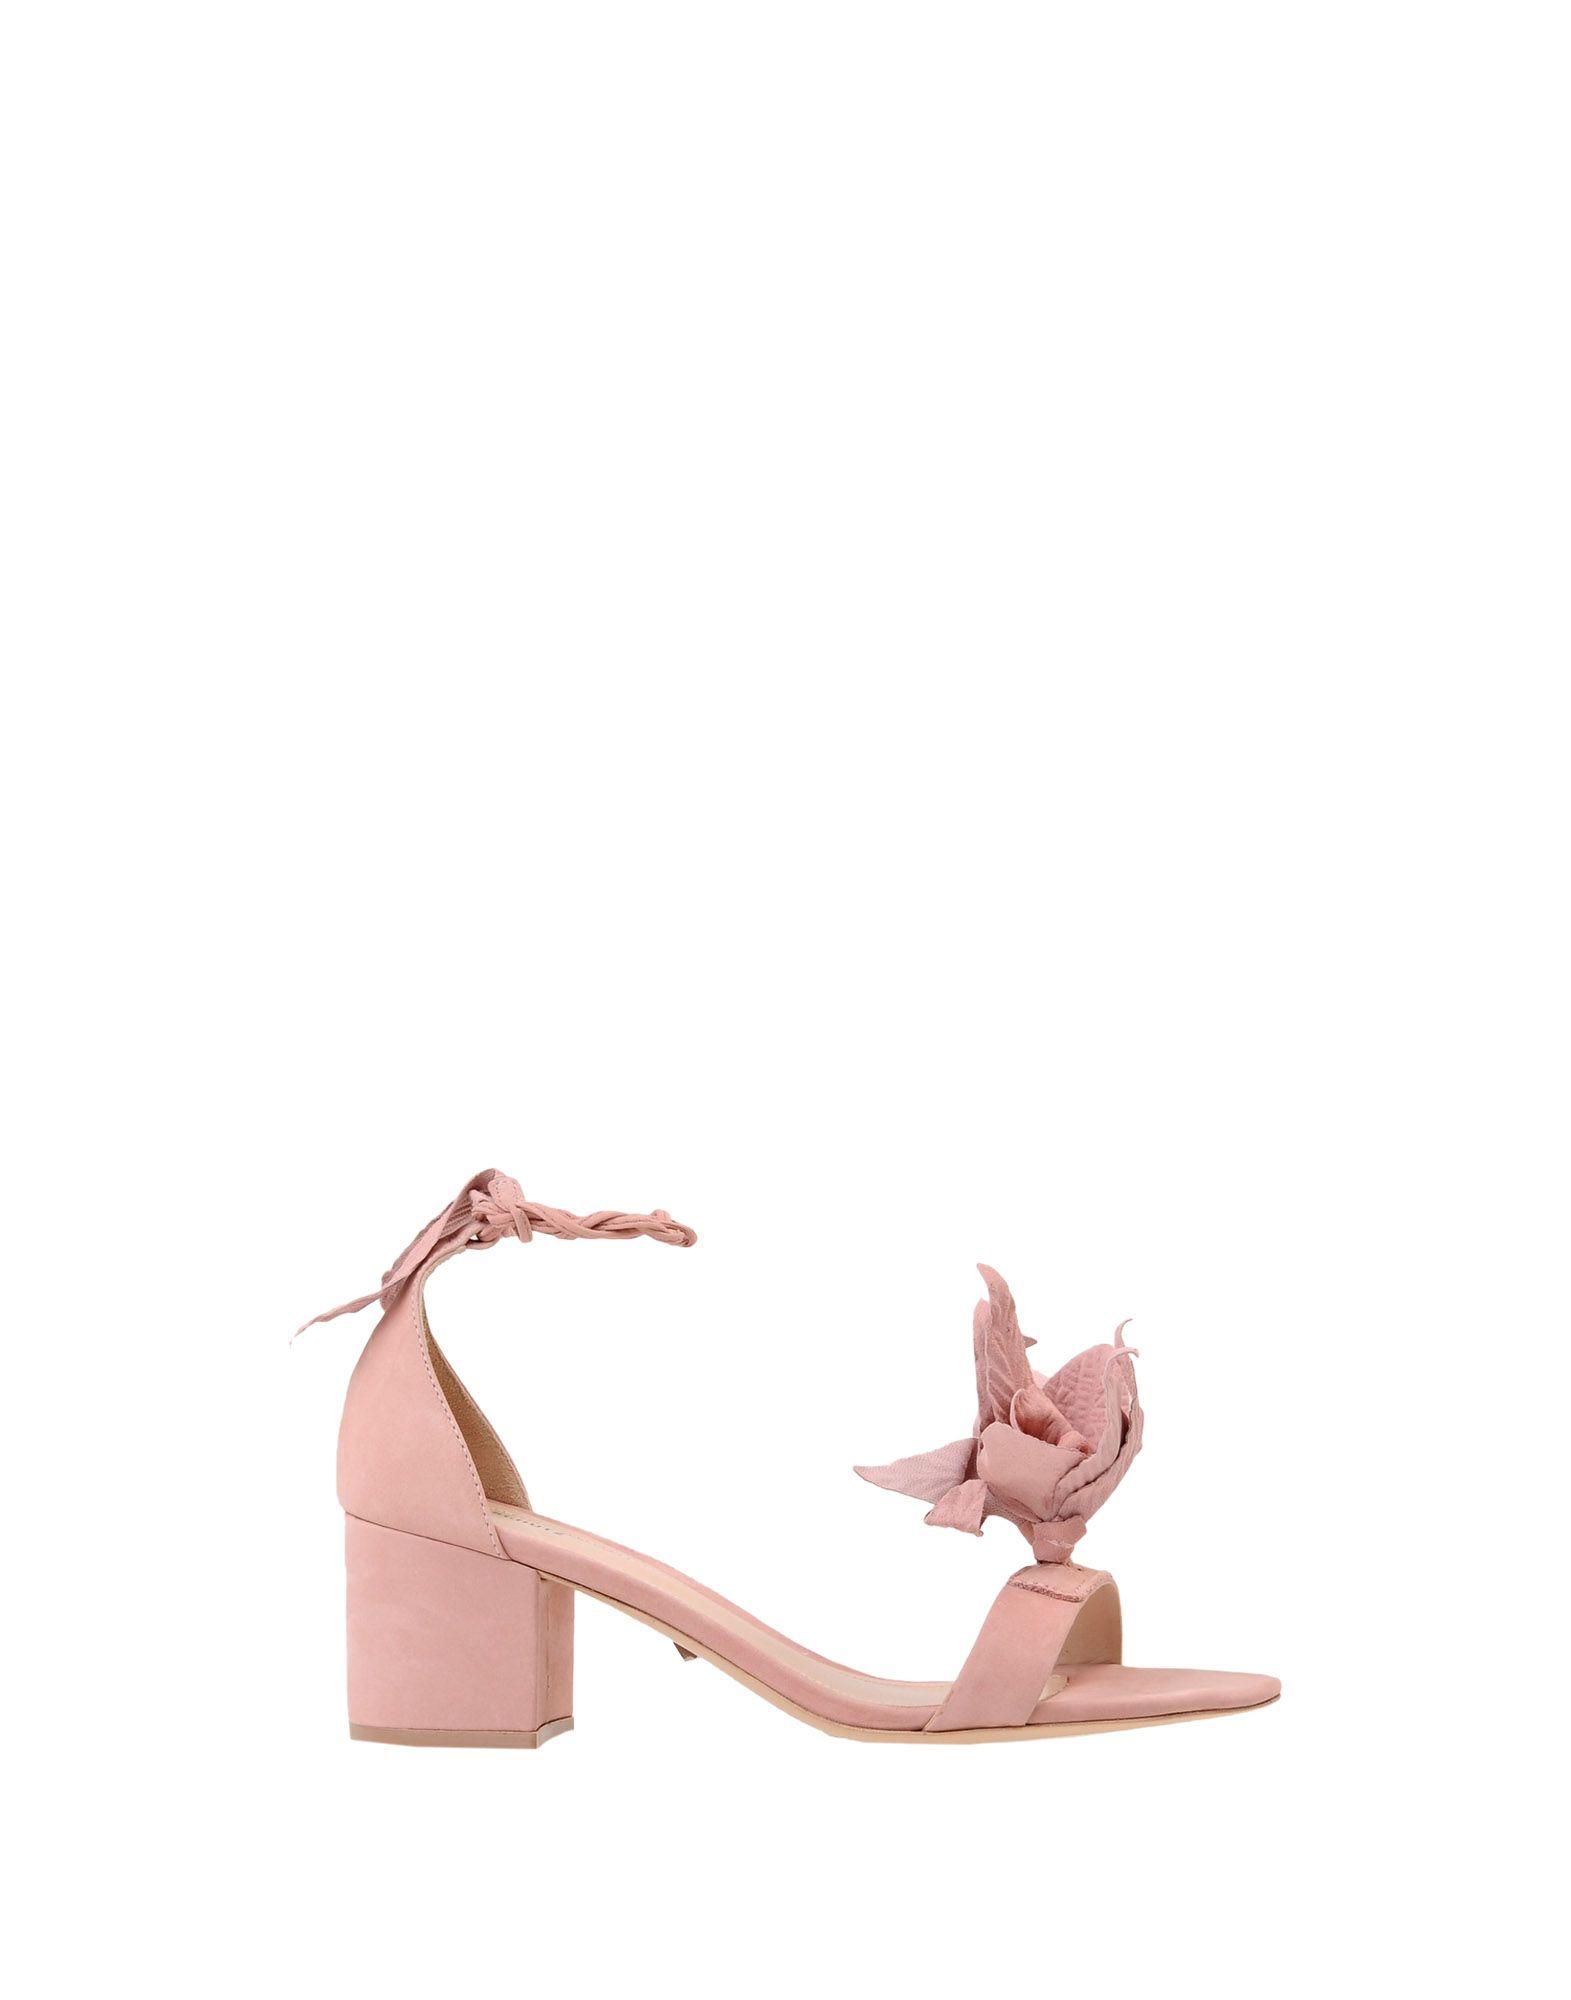 Stilvolle billige Schuhe Damen Schutz Sandalen Damen Schuhe  11458443RQ 56f3f1